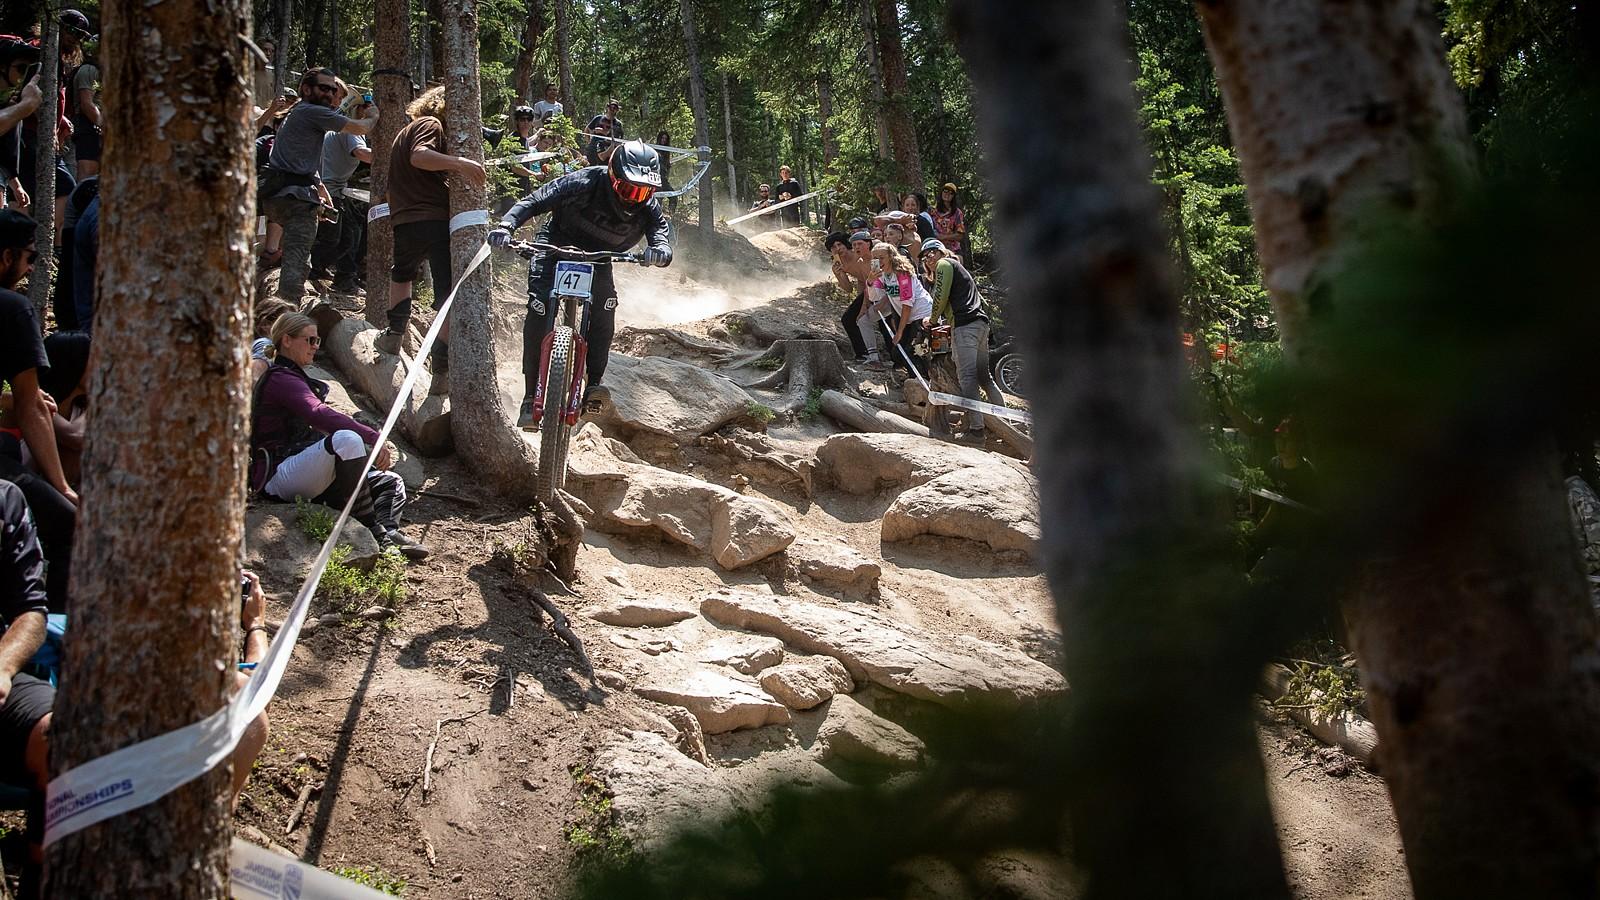 Walker Shaw - US National Champs Downhill Photo Blast - Mountain Biking Pictures - Vital MTB